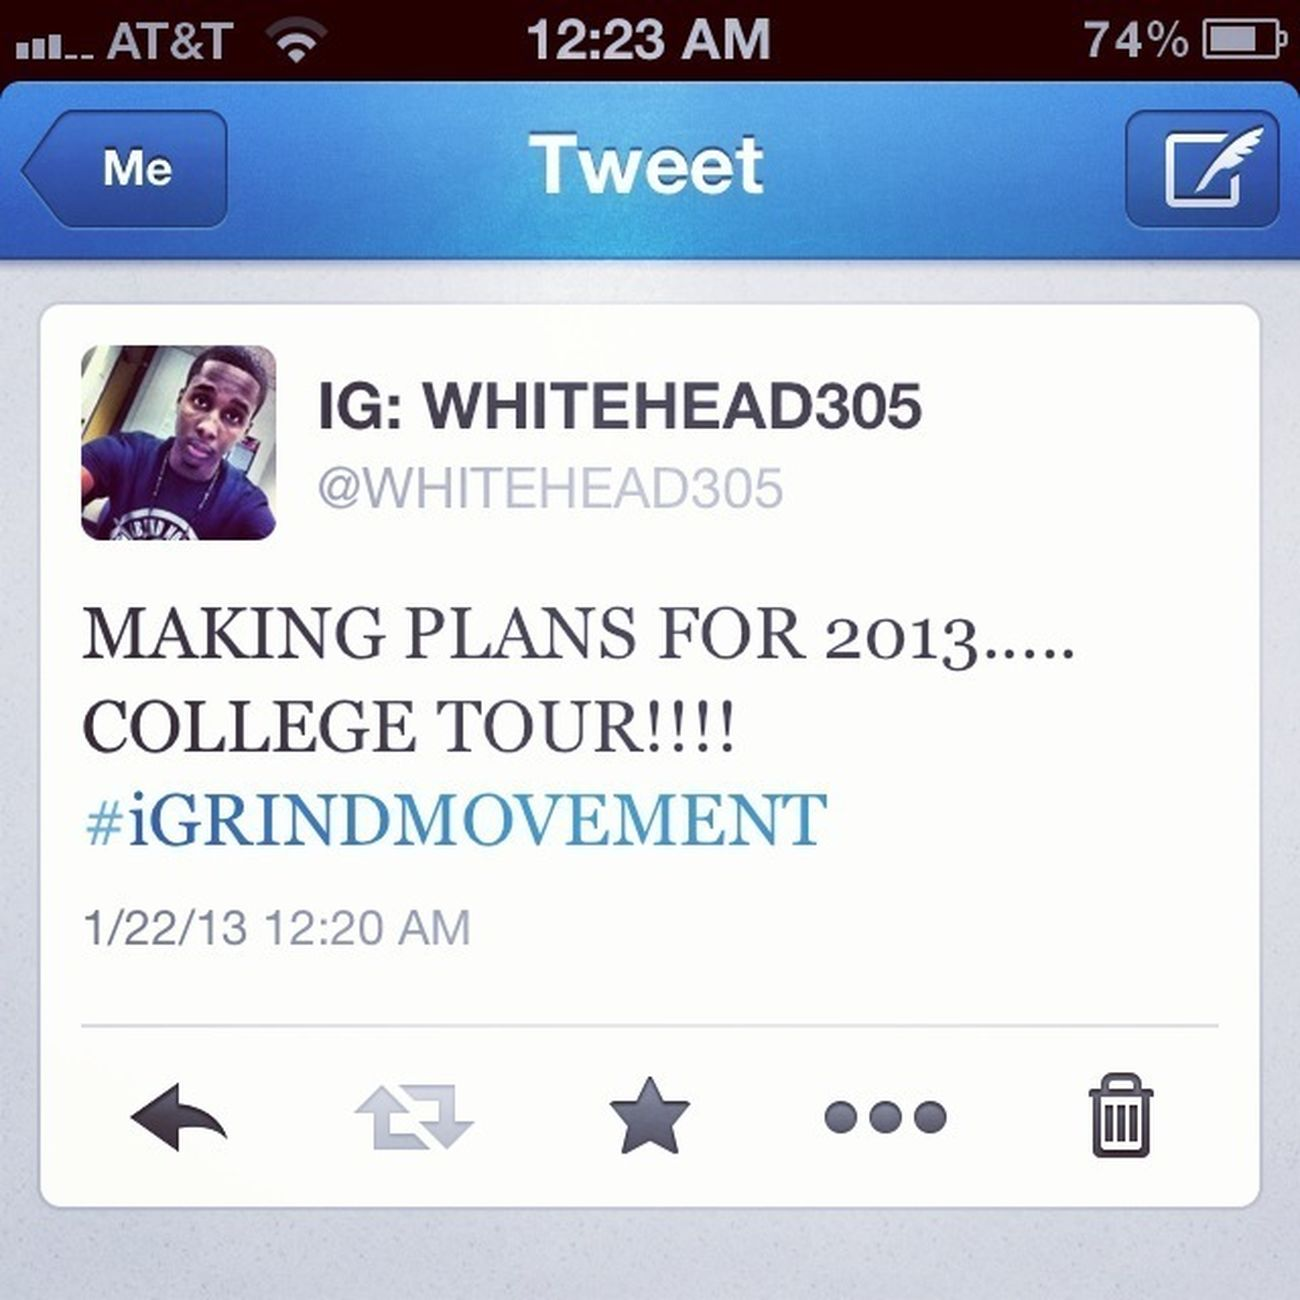 2013..... LOOKING GOOD!!! #iGRINDMOVEMENT